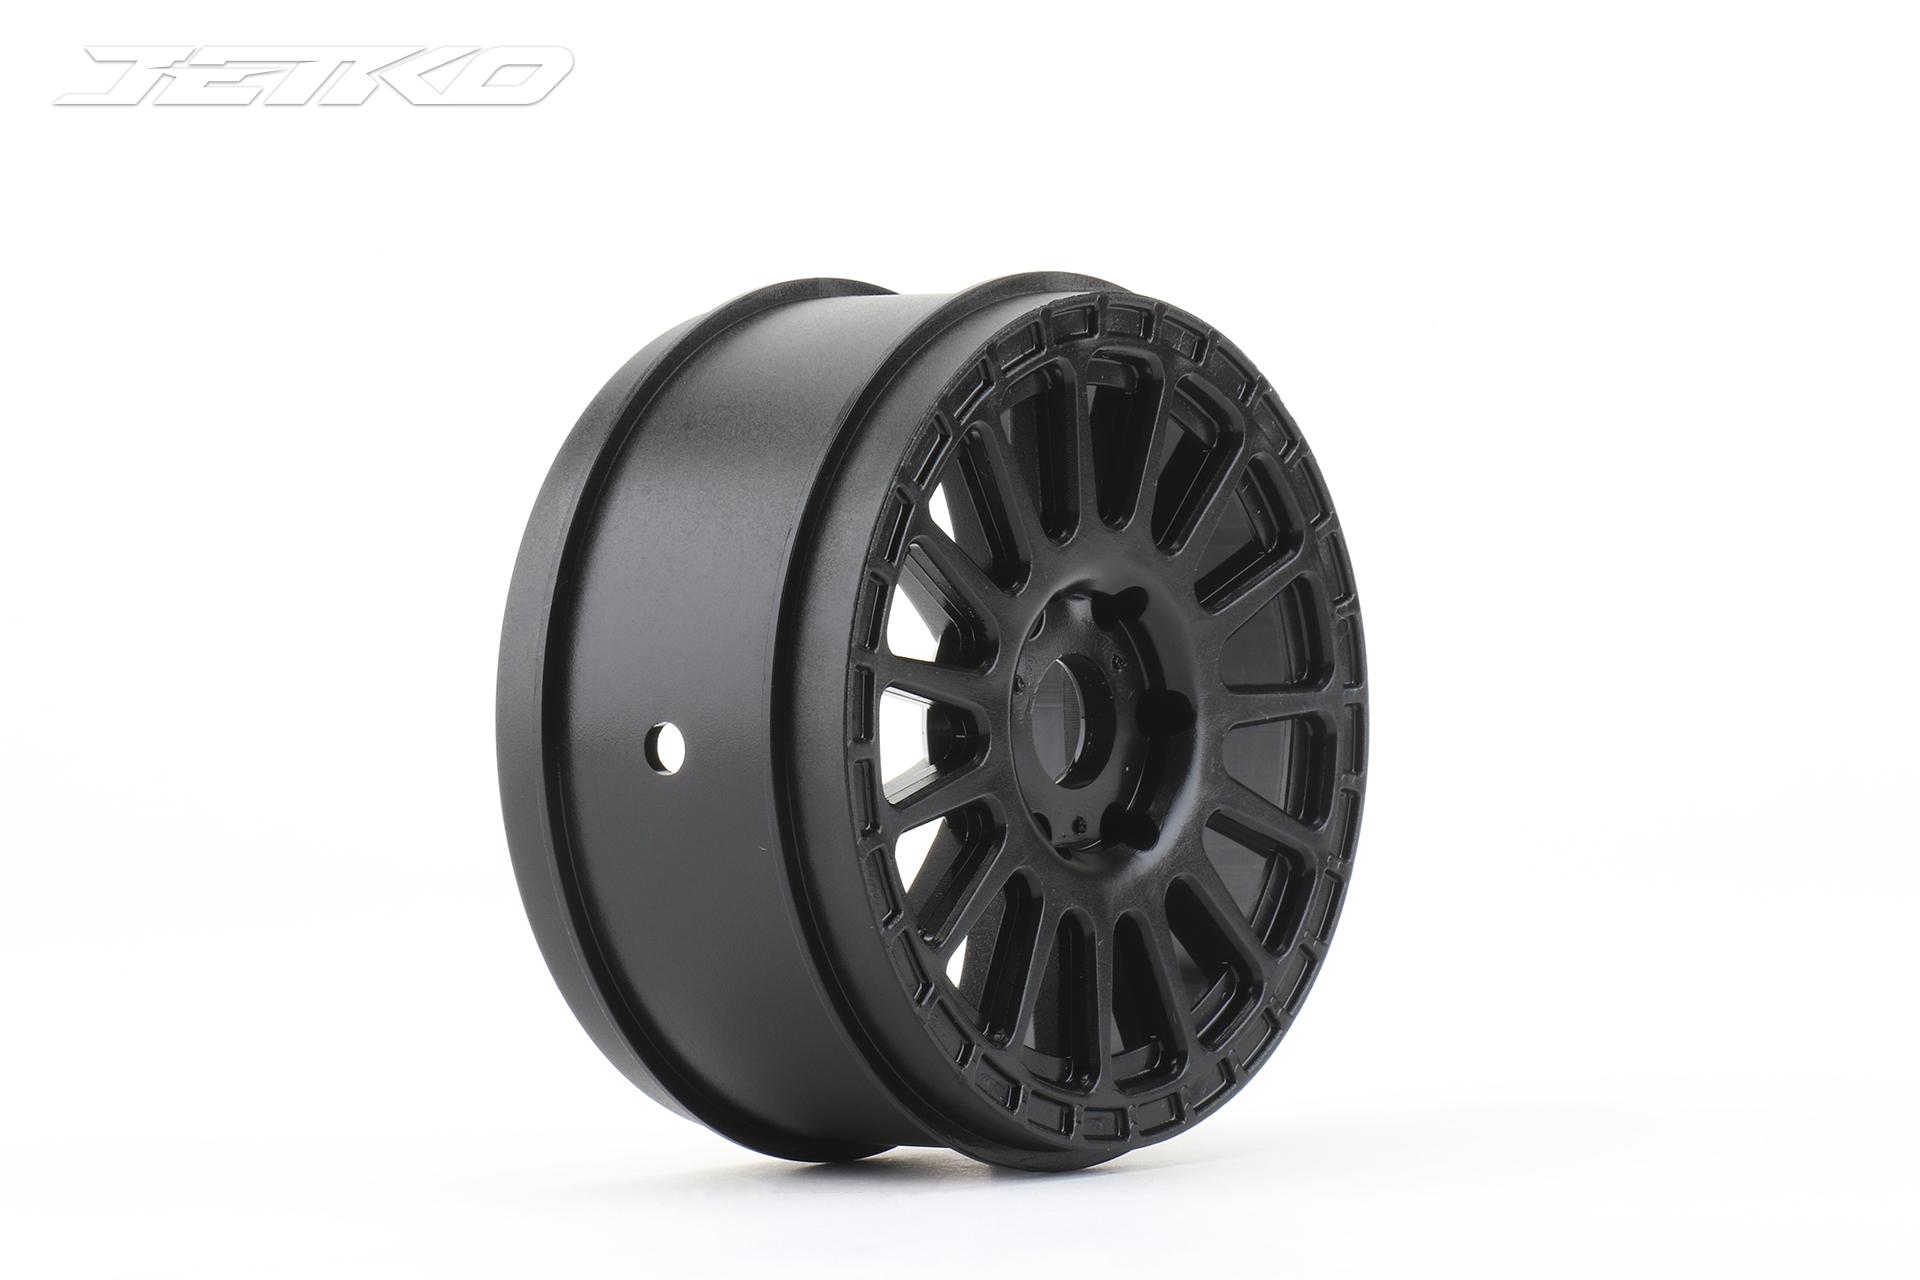 1/8 Buggy Radial Wheel (Black)